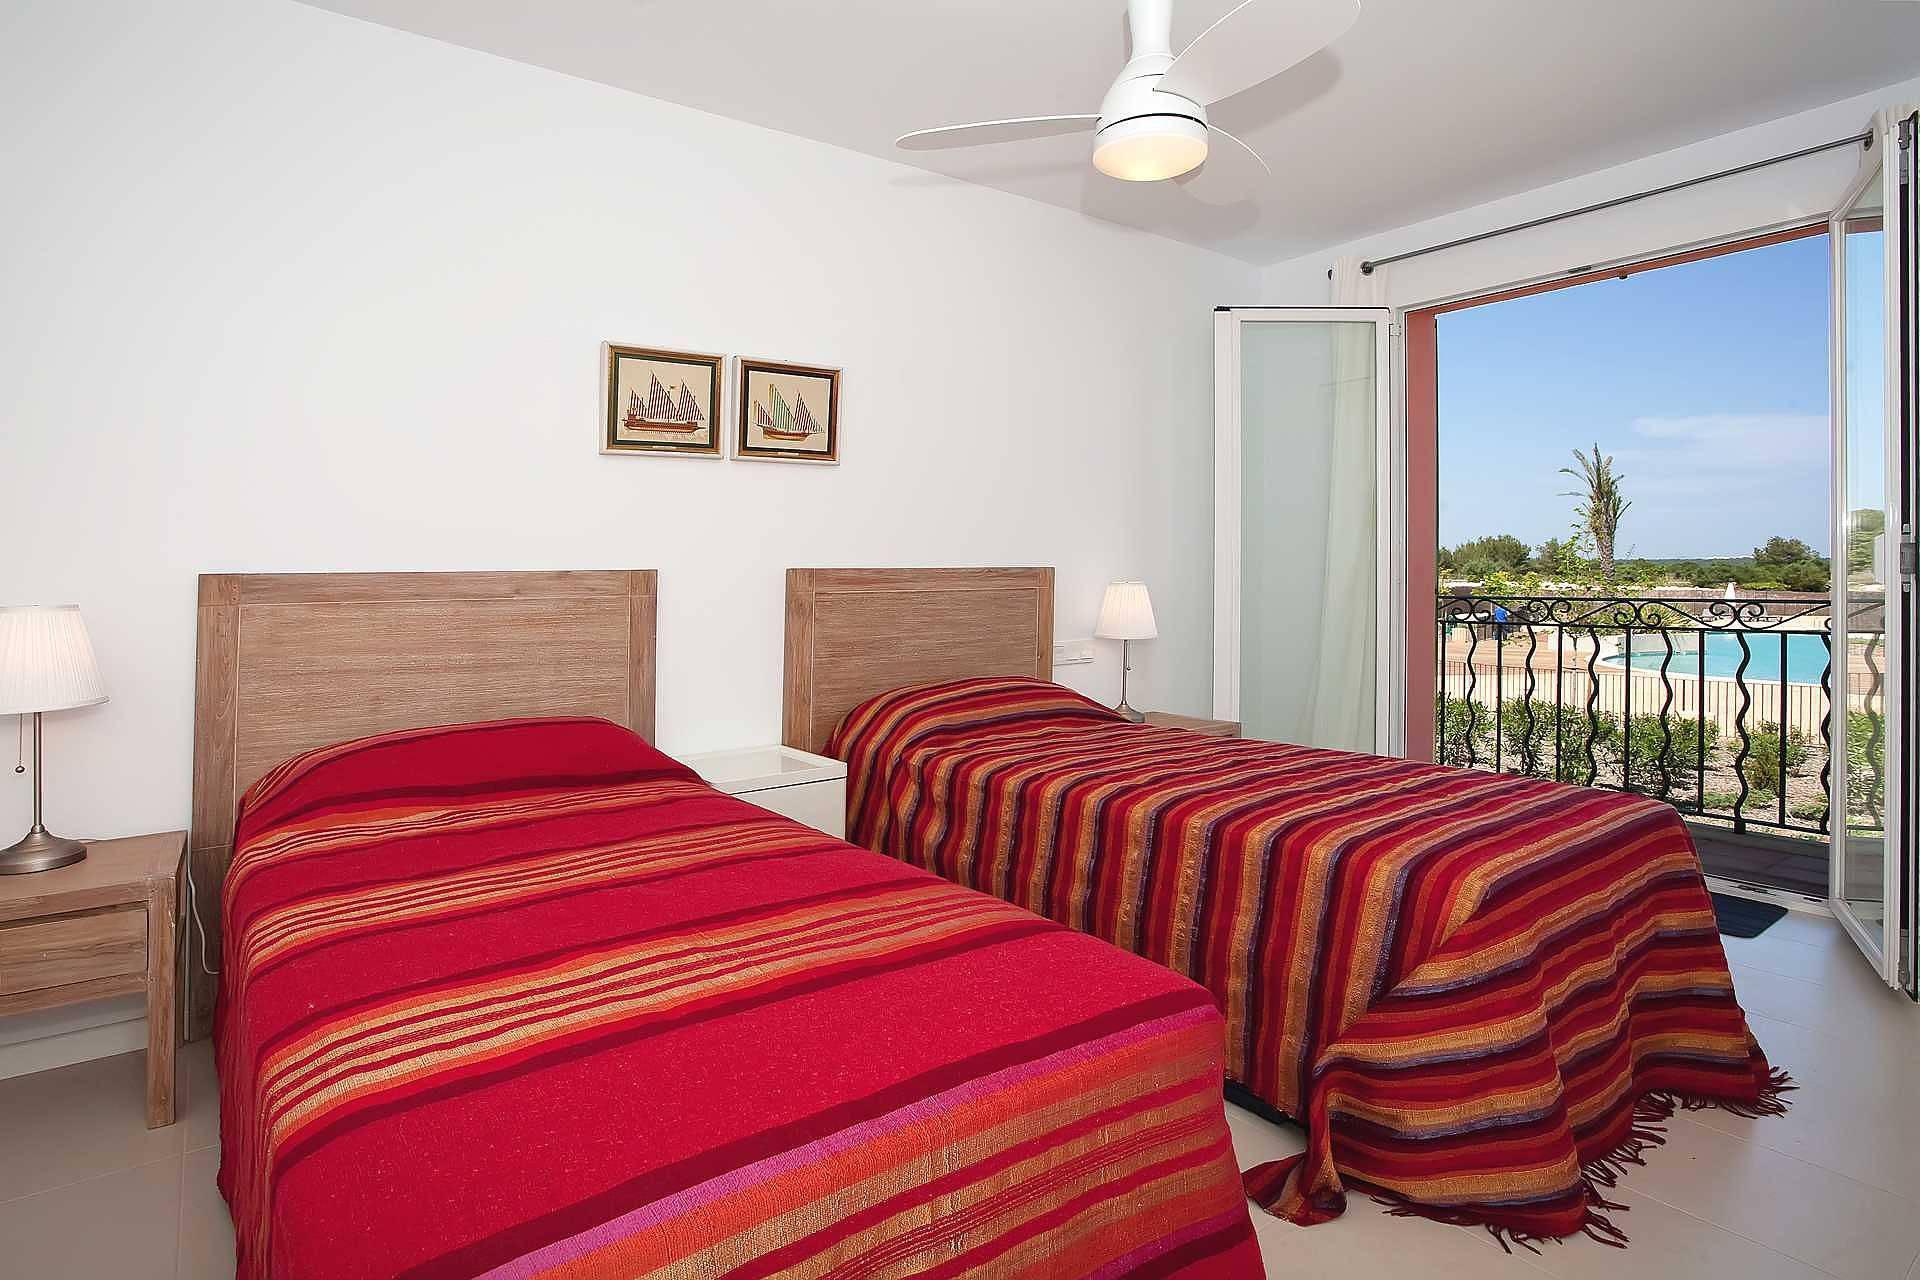 01-62 Modernes Ferienhaus Mallorca Osten Bild 22